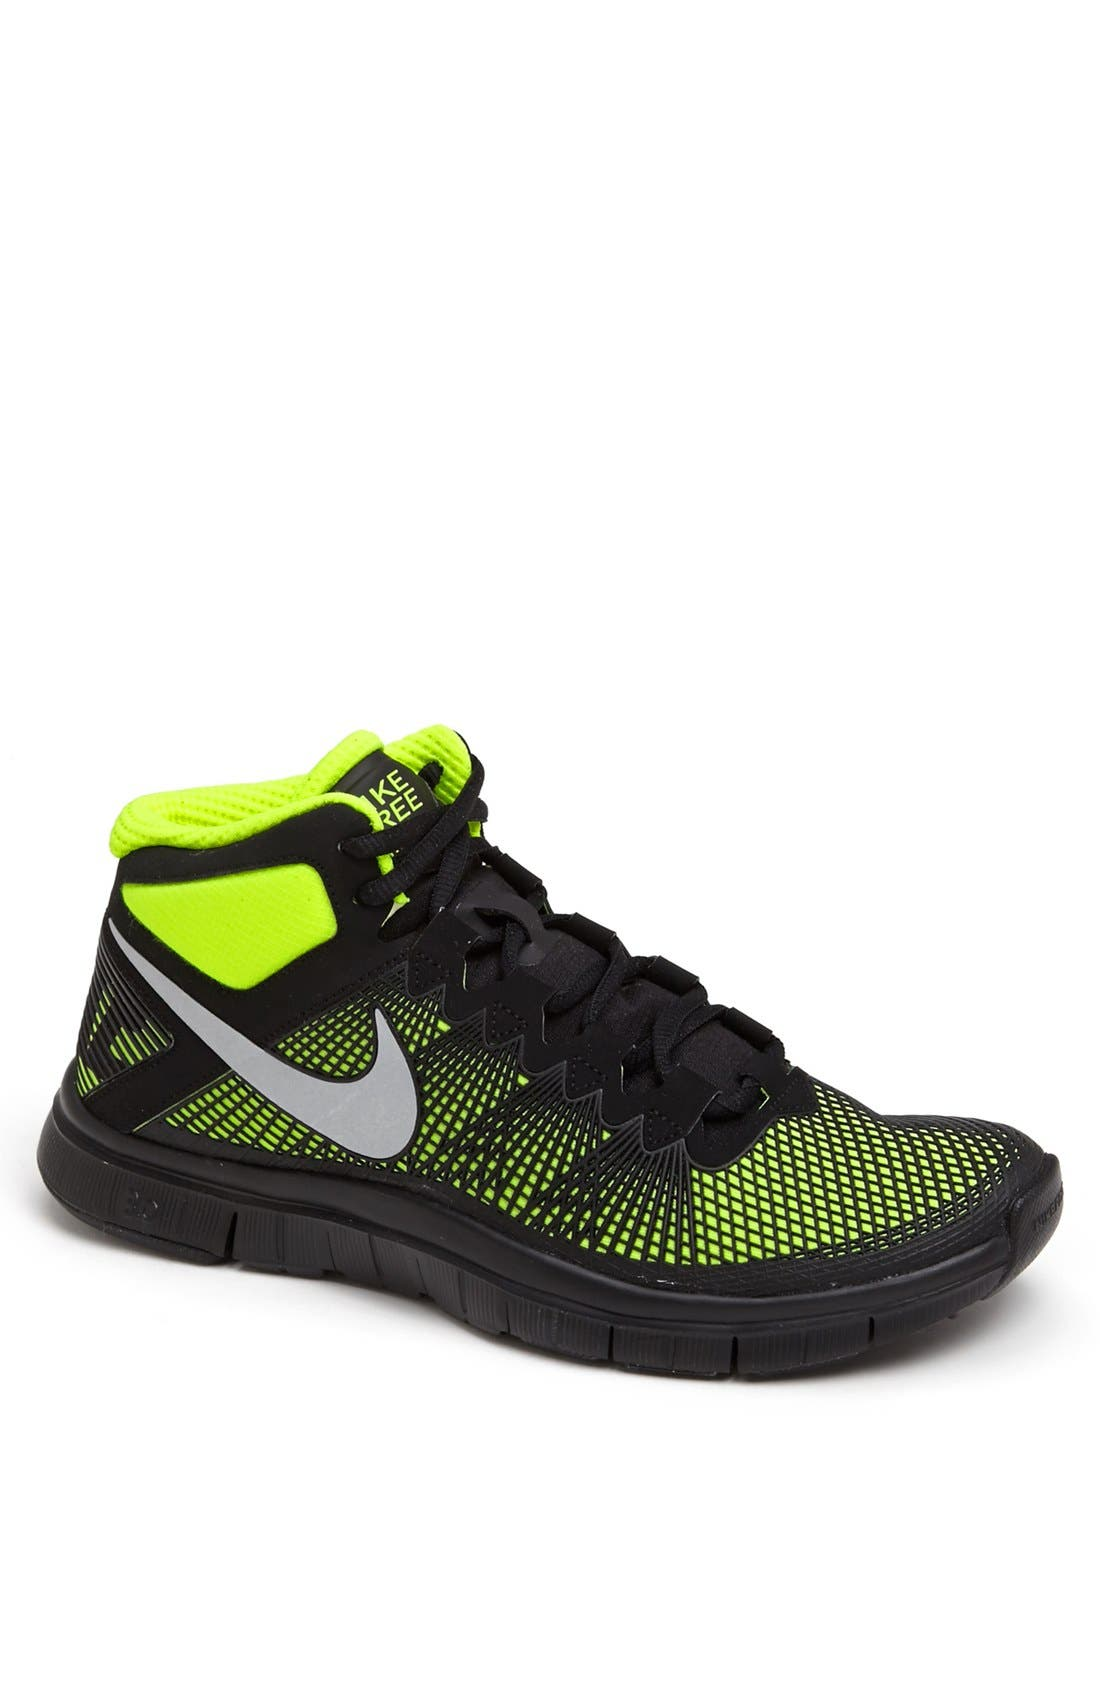 Main Image - Nike 'Free Trainer 3.0 Mid' Training Shoe (Men)